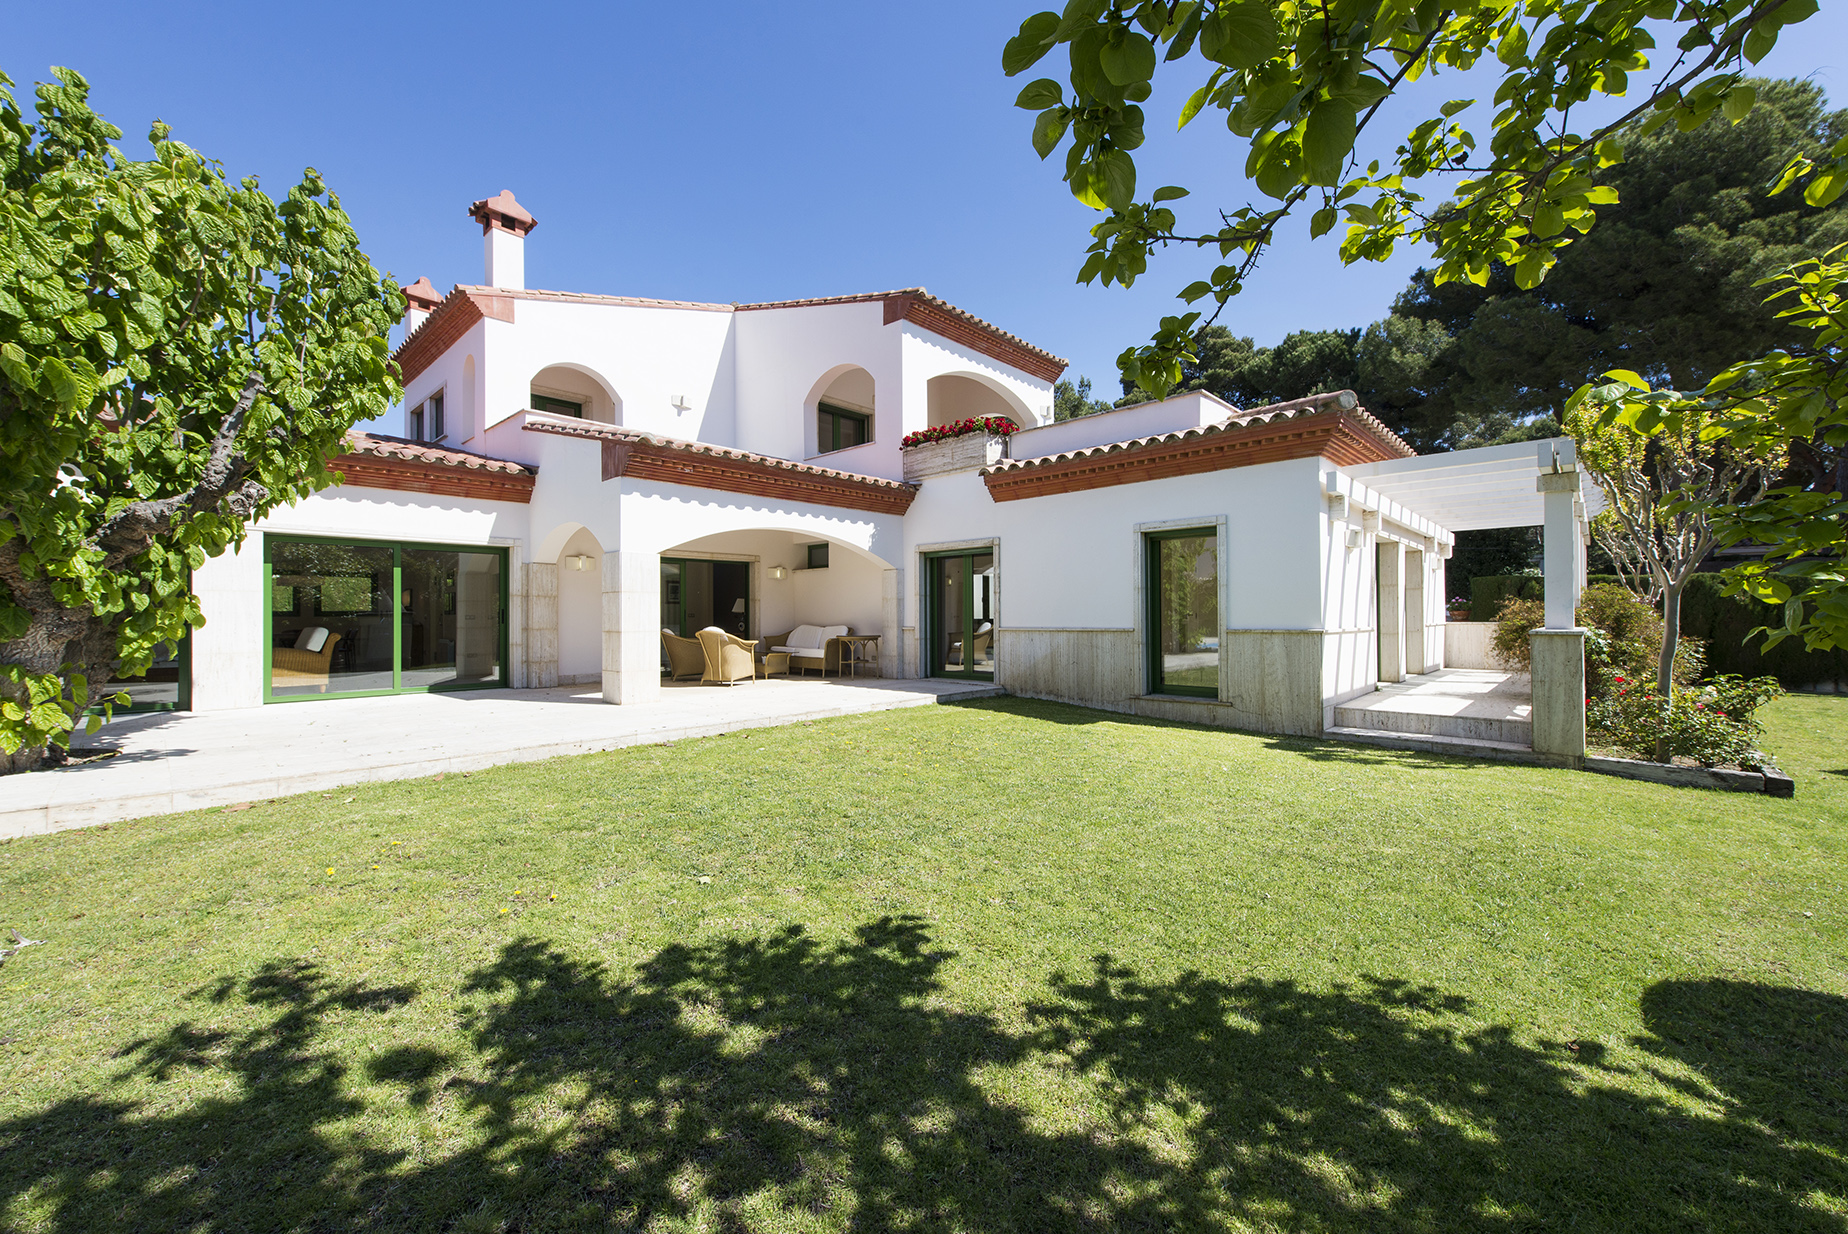 Single Family Home for Sale at Casa en privada urbanización La Gavina a 400 metros de la playa S'Agaro, Costa Brava, 17248 Spain